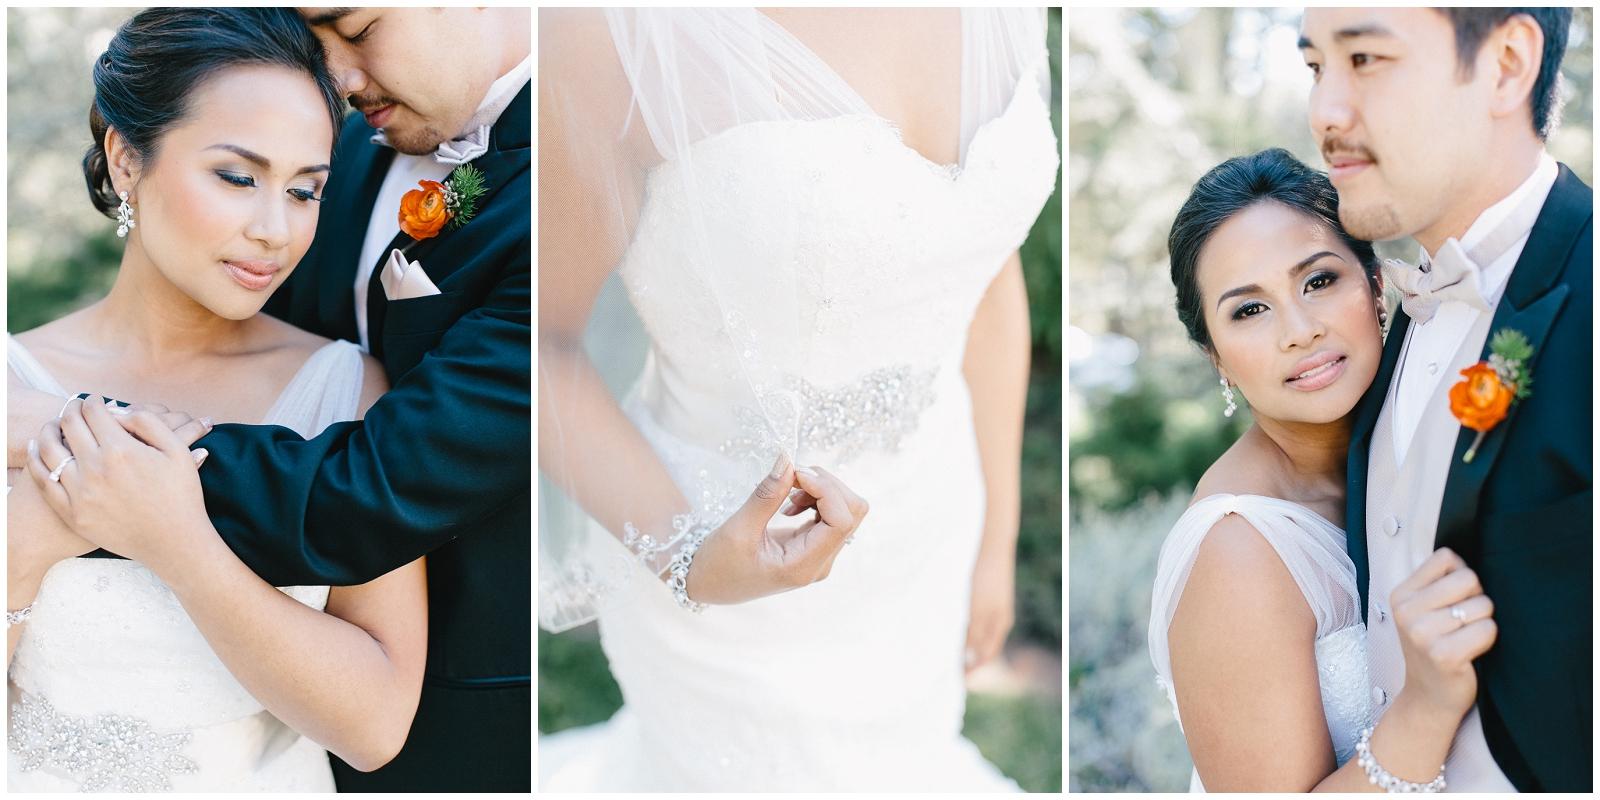 San-Francisco-Bay-Area-Wedding-Photography_Skyline_Church_3.jpg